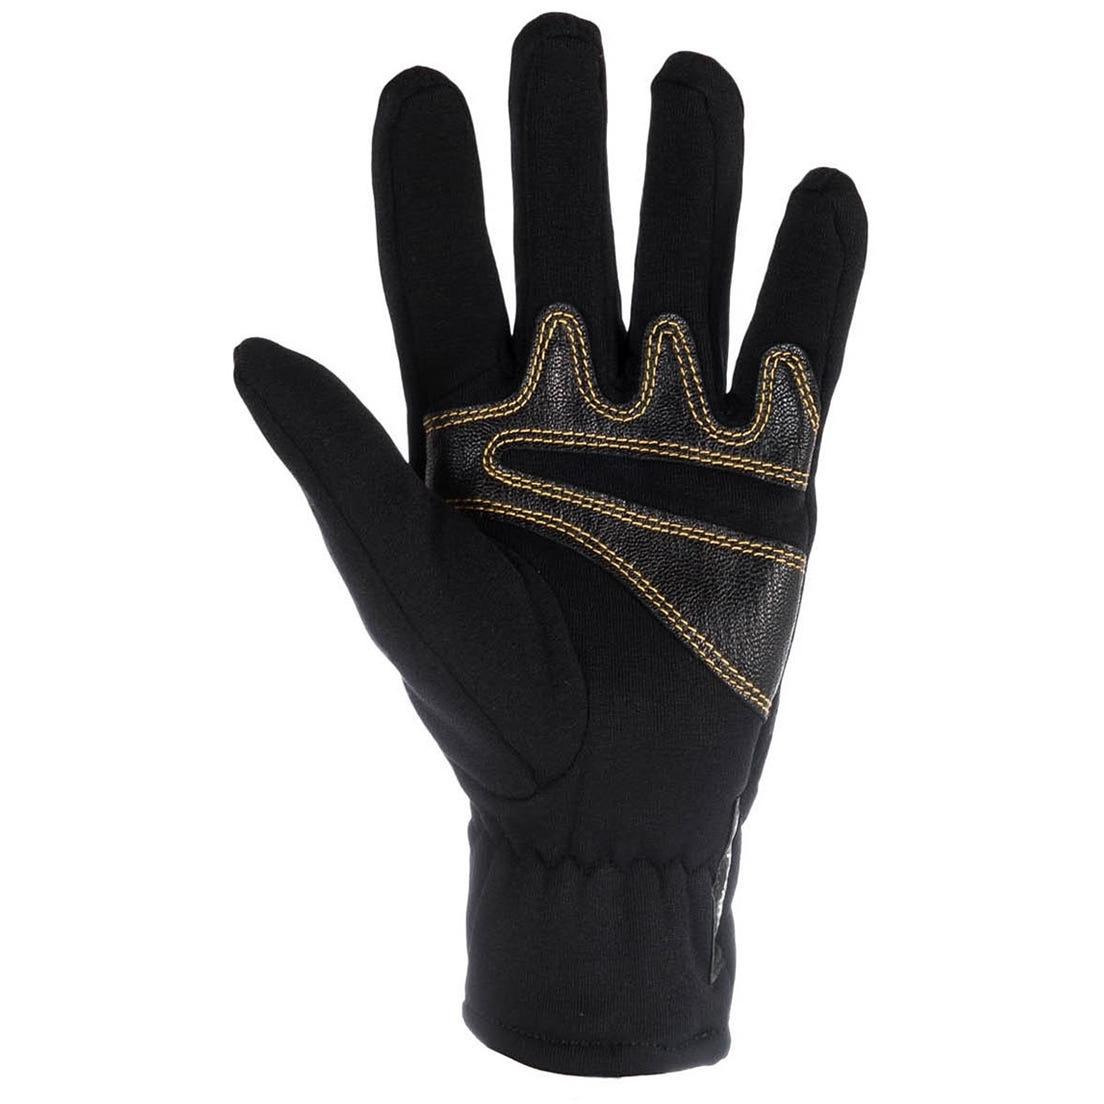 Image of La Sportiva Stretch Gloves - Black/Yellow